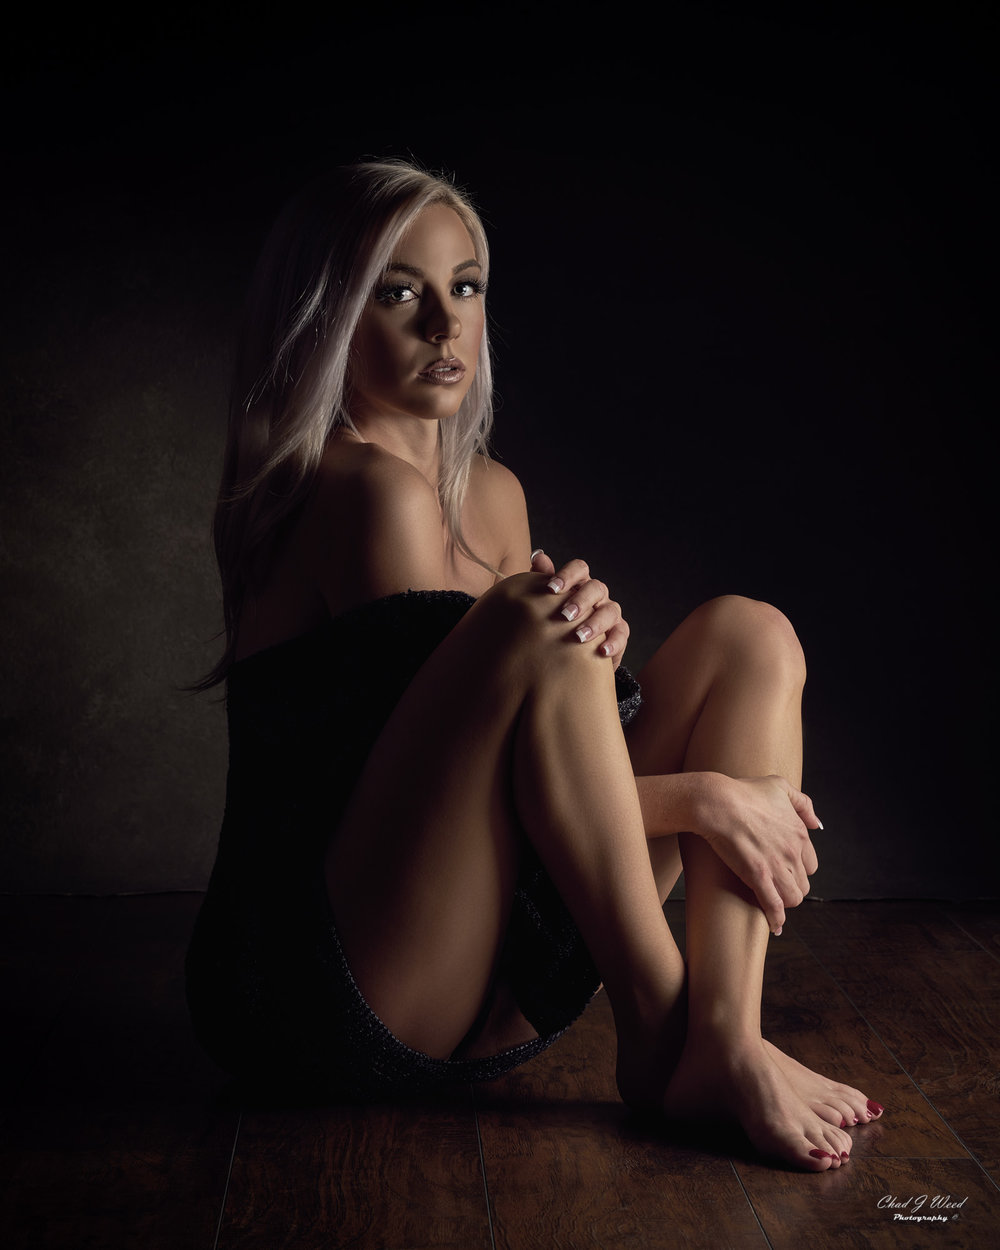 Mesa Arizona Glamour Photographer Chad Weed of Model Taylor